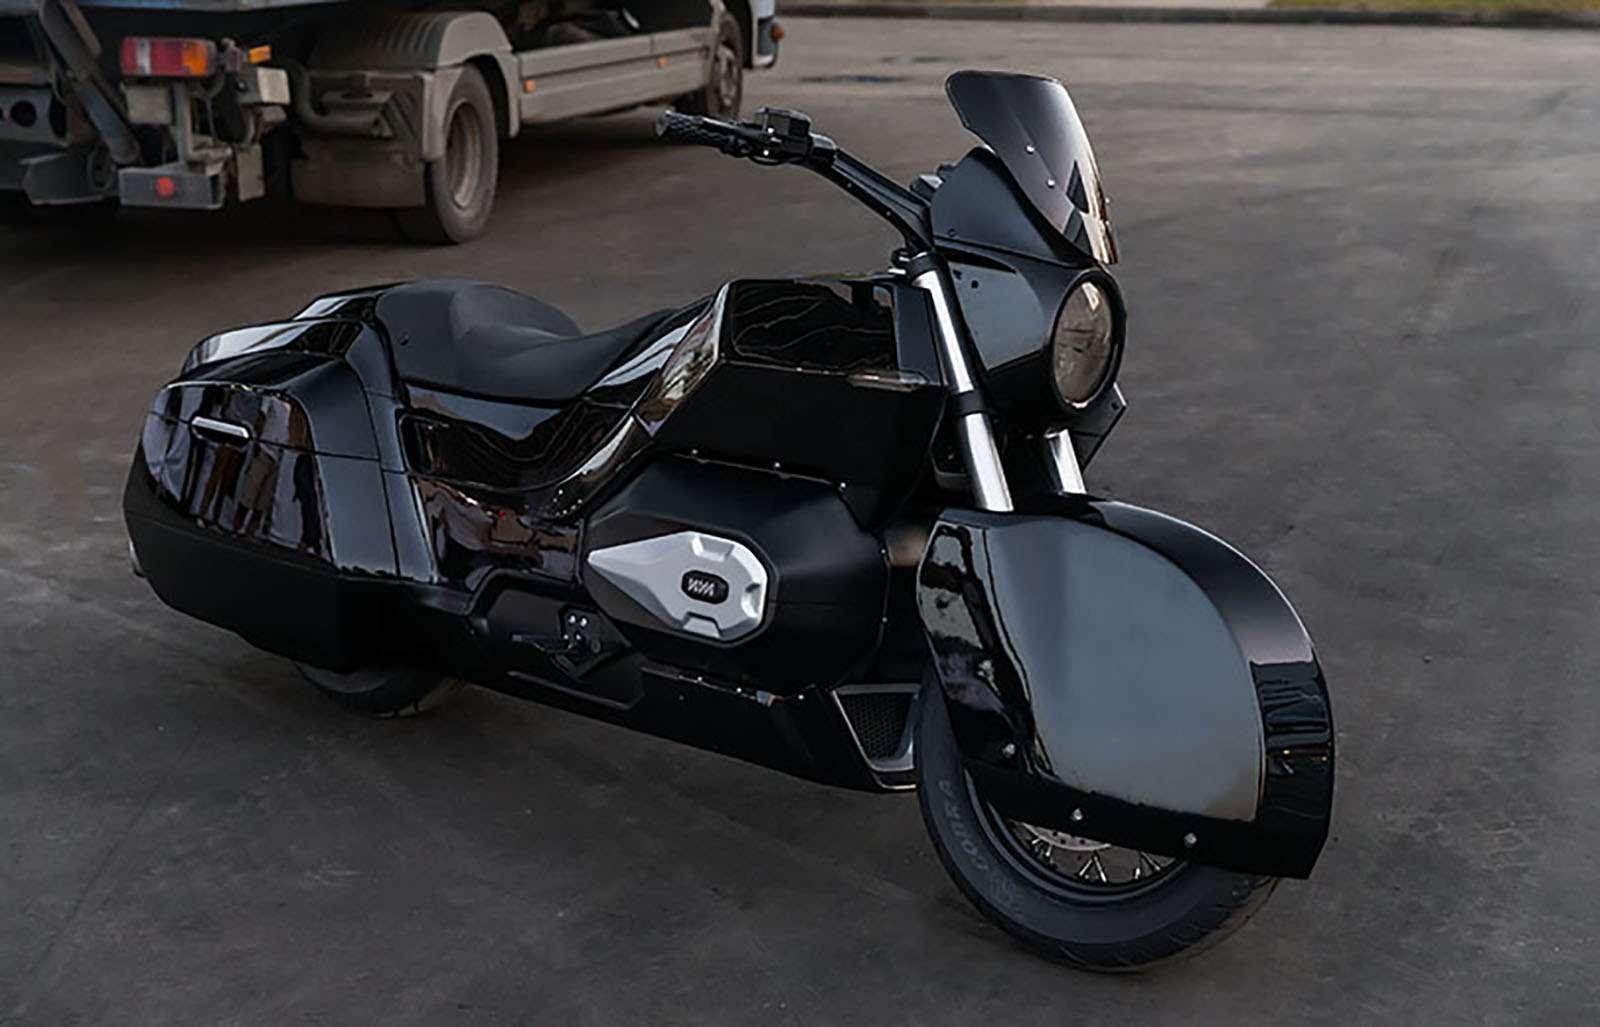 Мотоцикл президентского «Кортежа»: секреты пластикового концепта— фото 815664